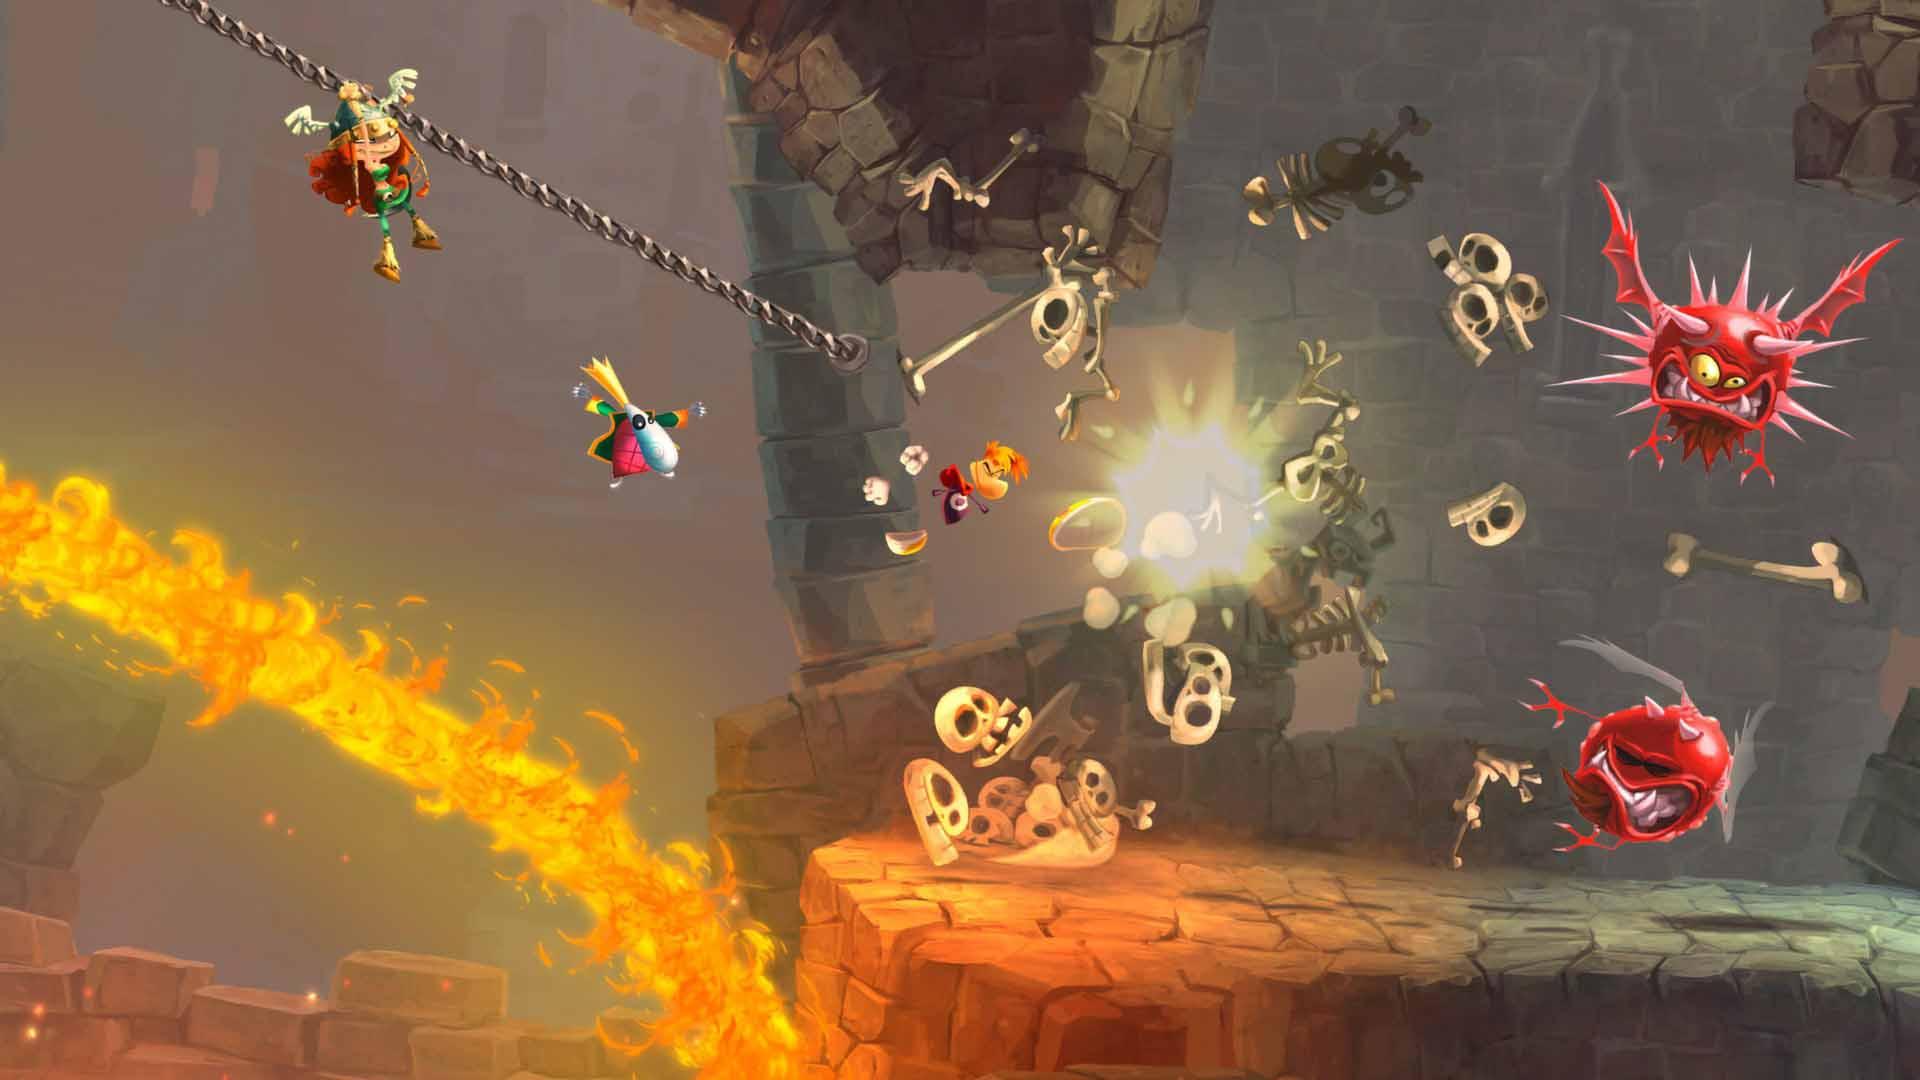 download-Rayman-Legends-hadoan-tv-1